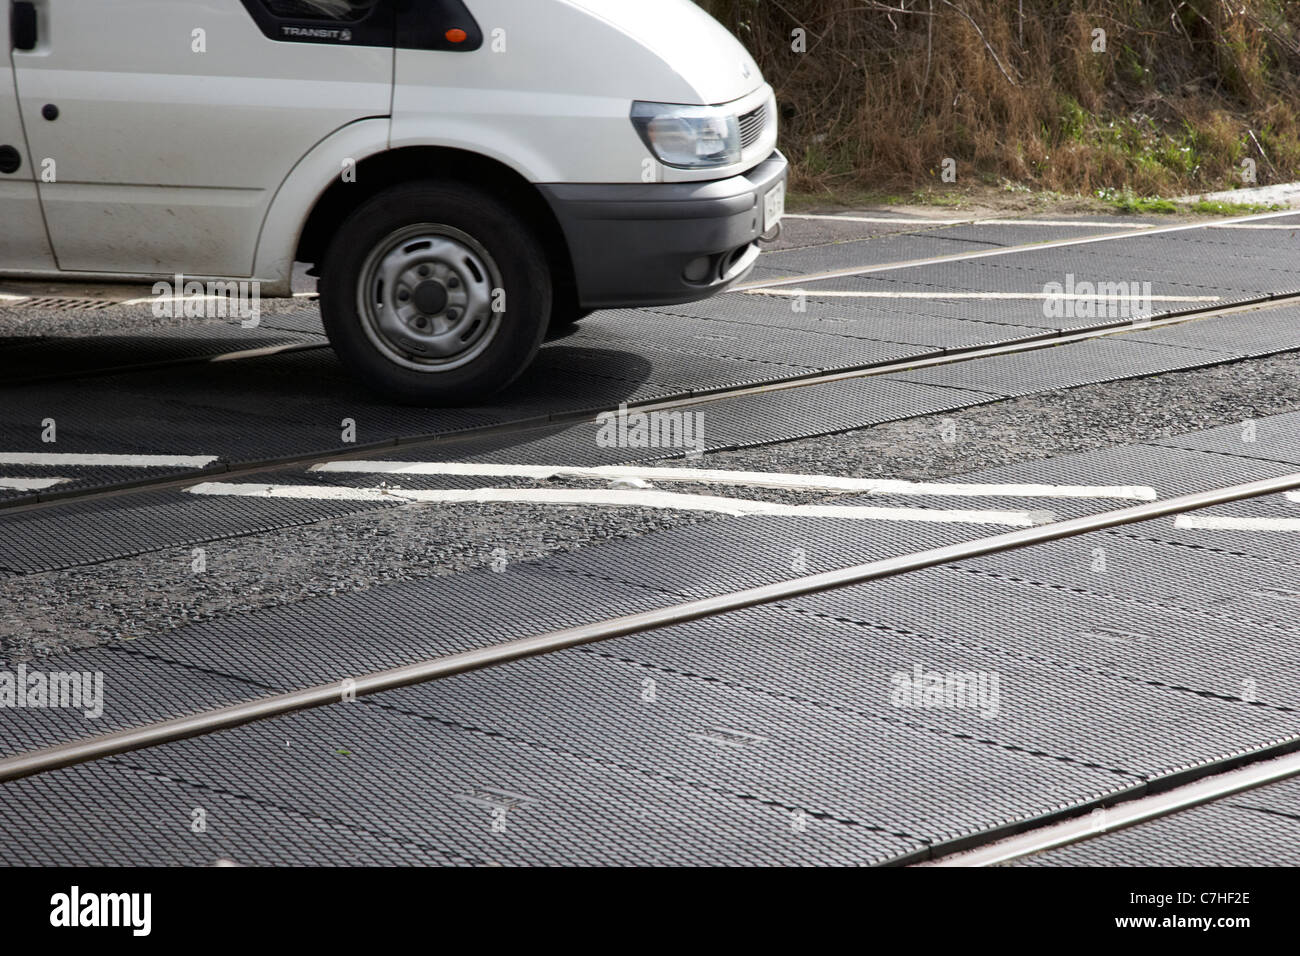 van crossing train tracks on level crossing northern ireland uk - Stock Image